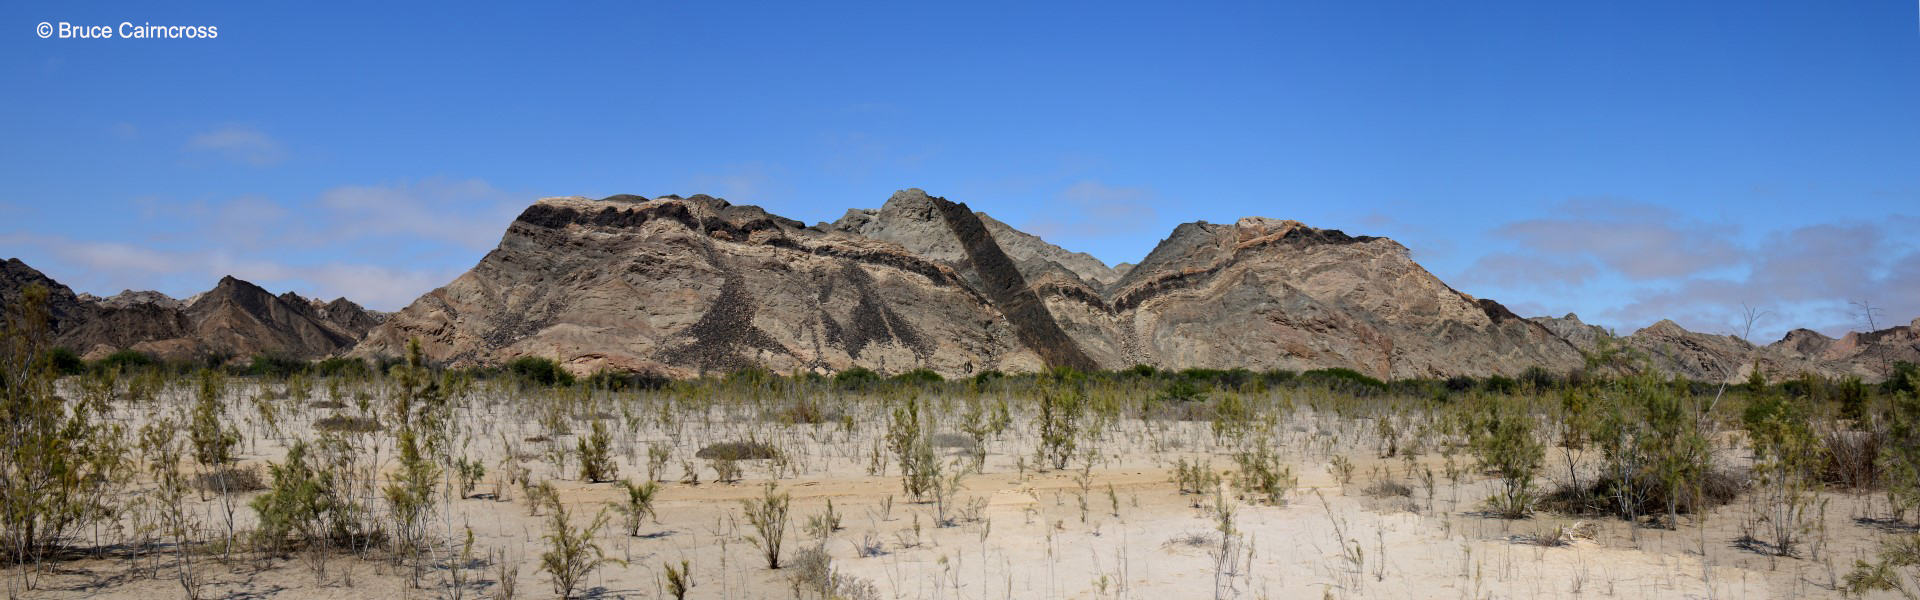 Swakop River Namibia Panorama Cairncross